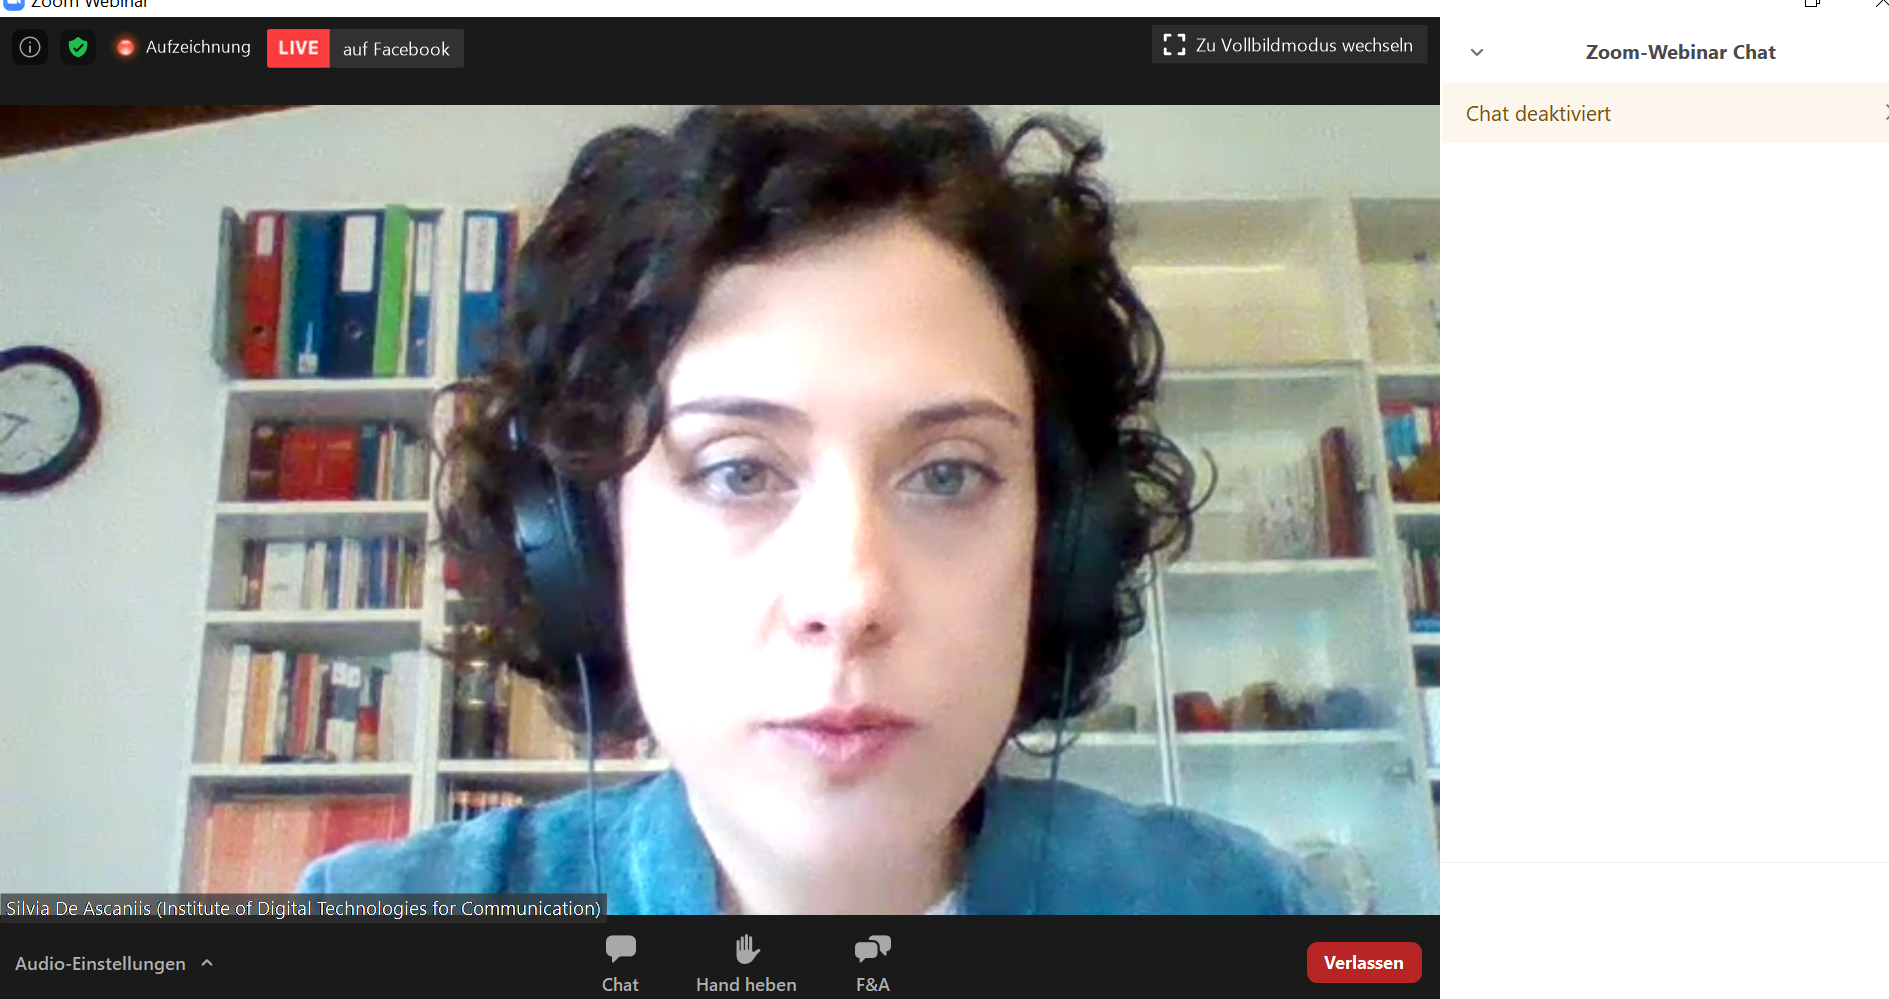 Prof. Cantoni & Dr. Silvia De Ascaniis @ Euromed 2020 (November 2-5, 2020)